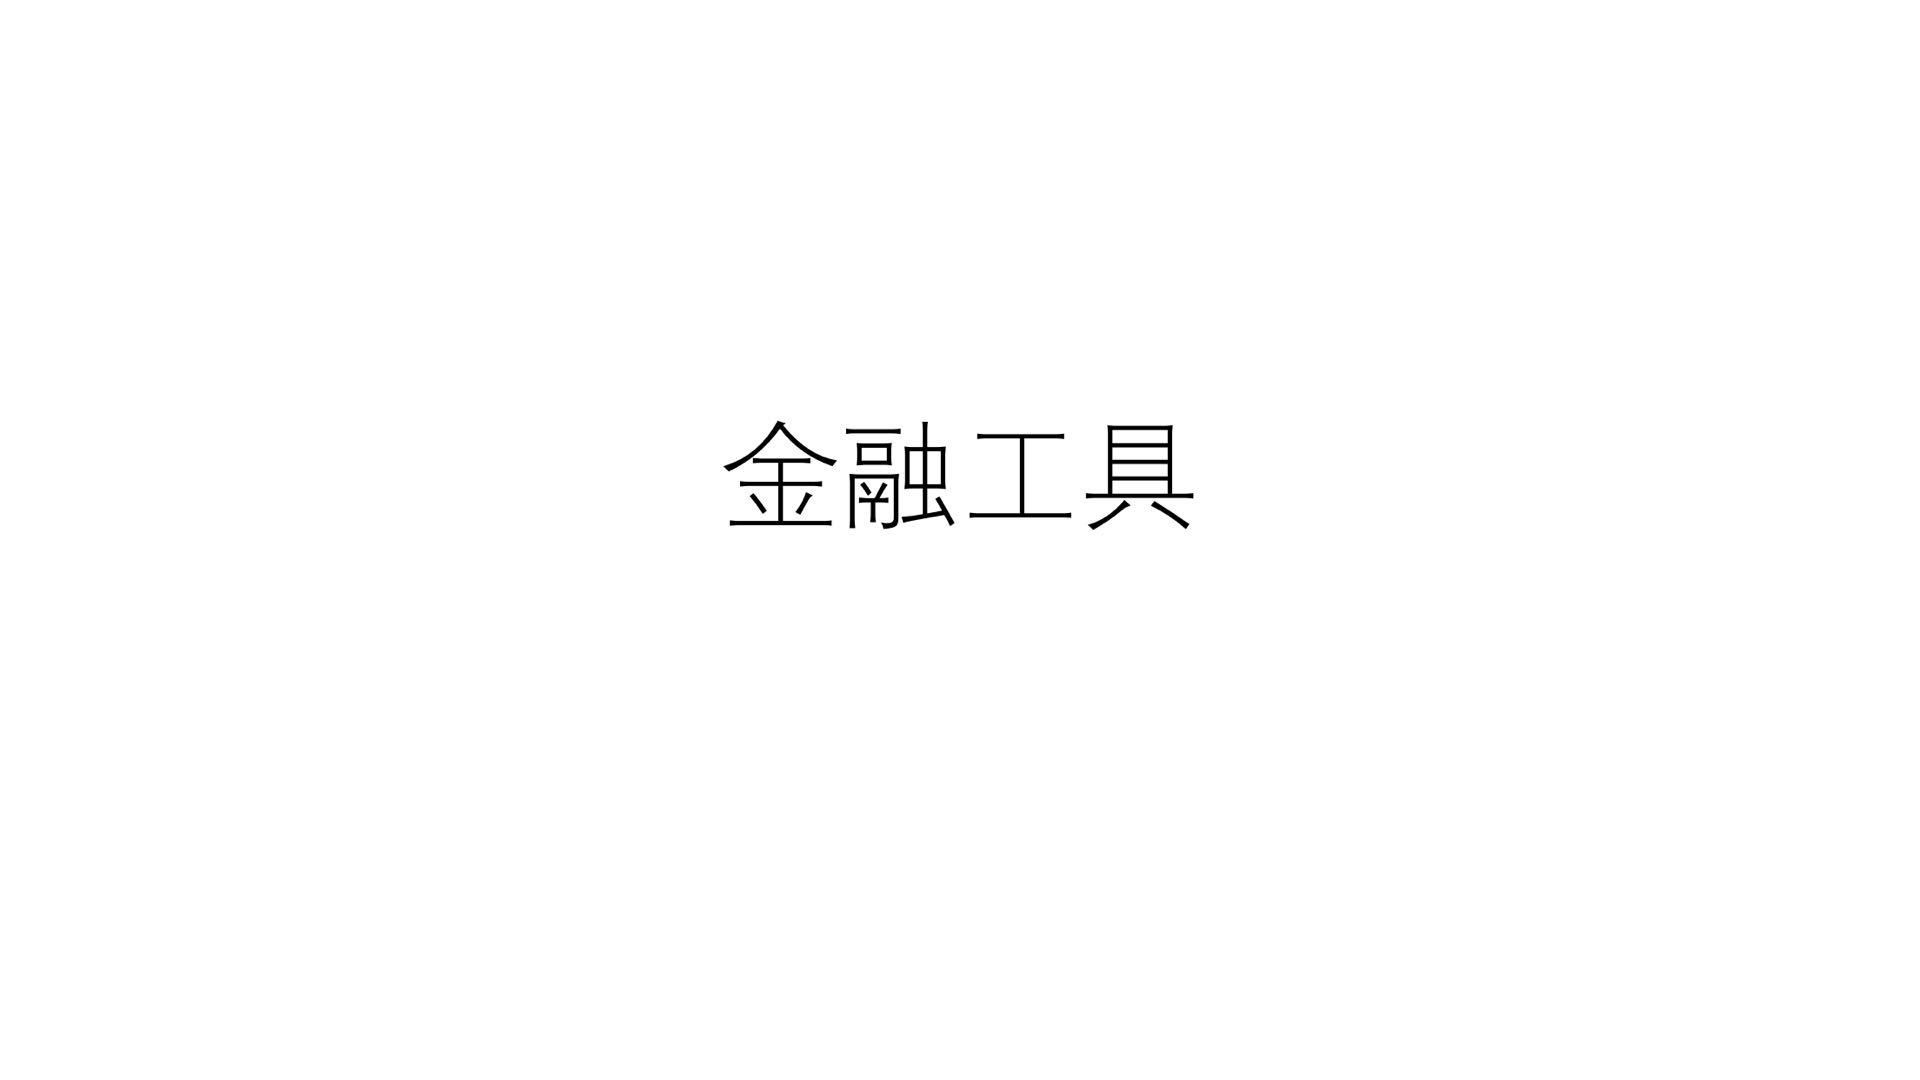 tmp_d7654a44f544045ccb76f9dc5342b5c1.jpg